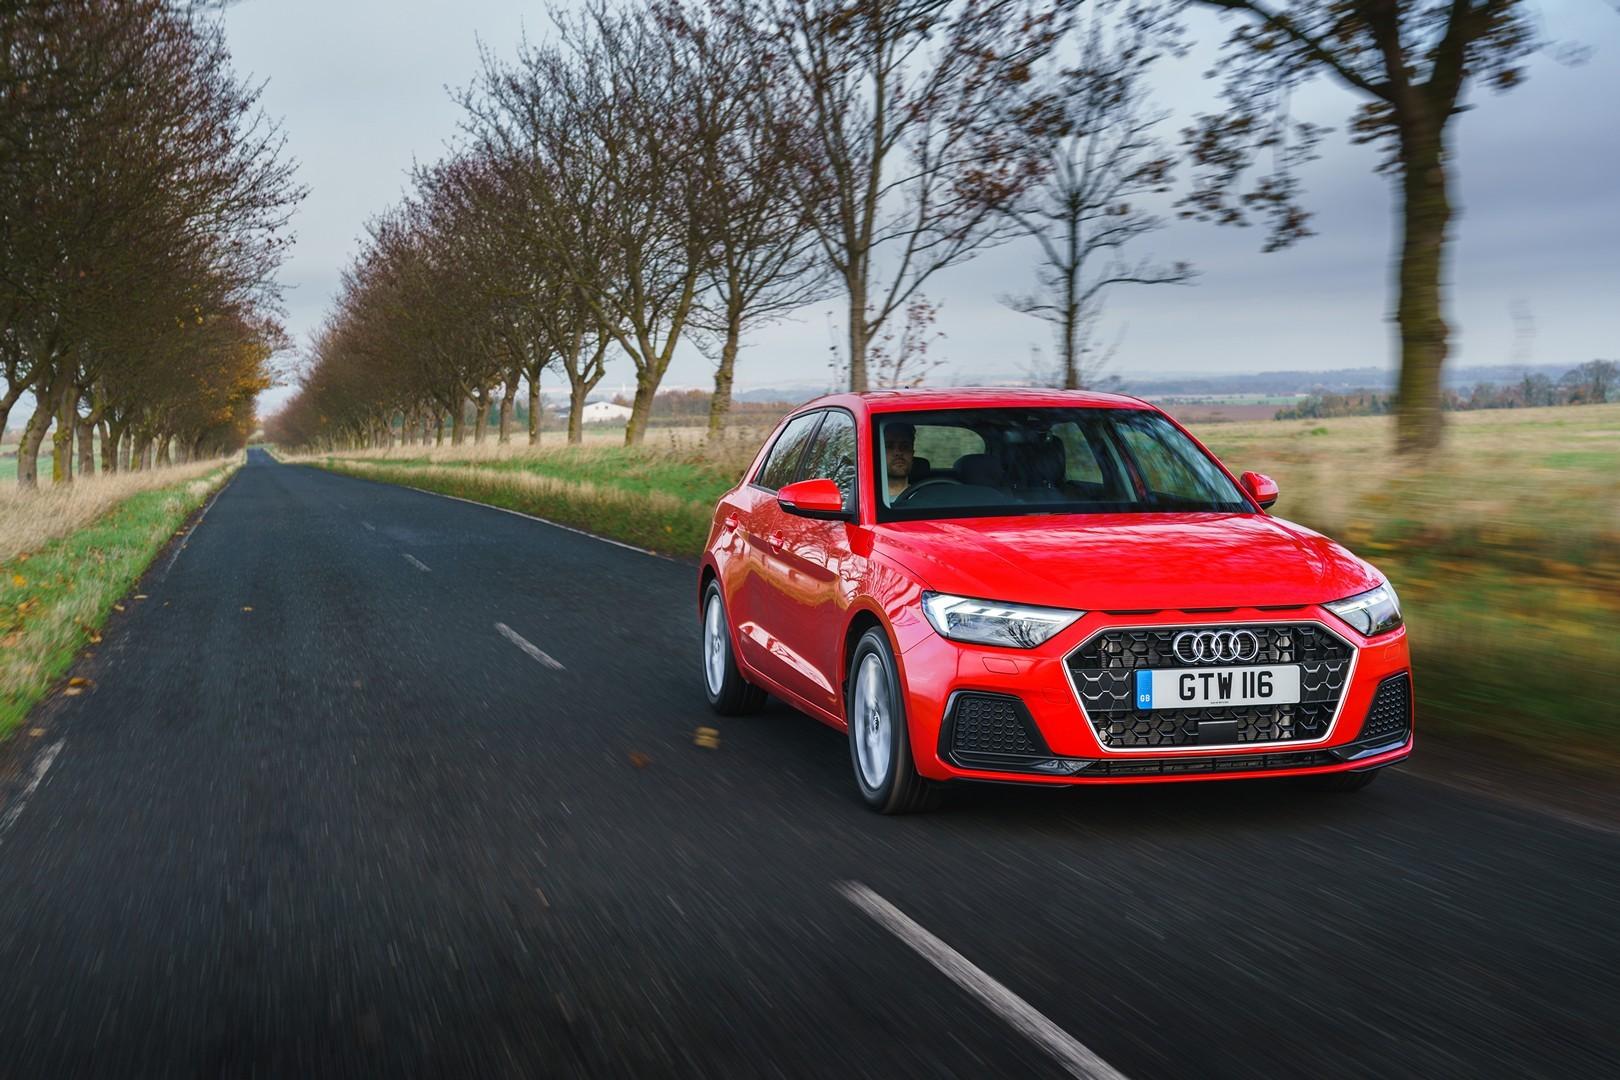 2019 Audi A1 Teases Virtual Cockpit, Huge MMI Screen Ahead